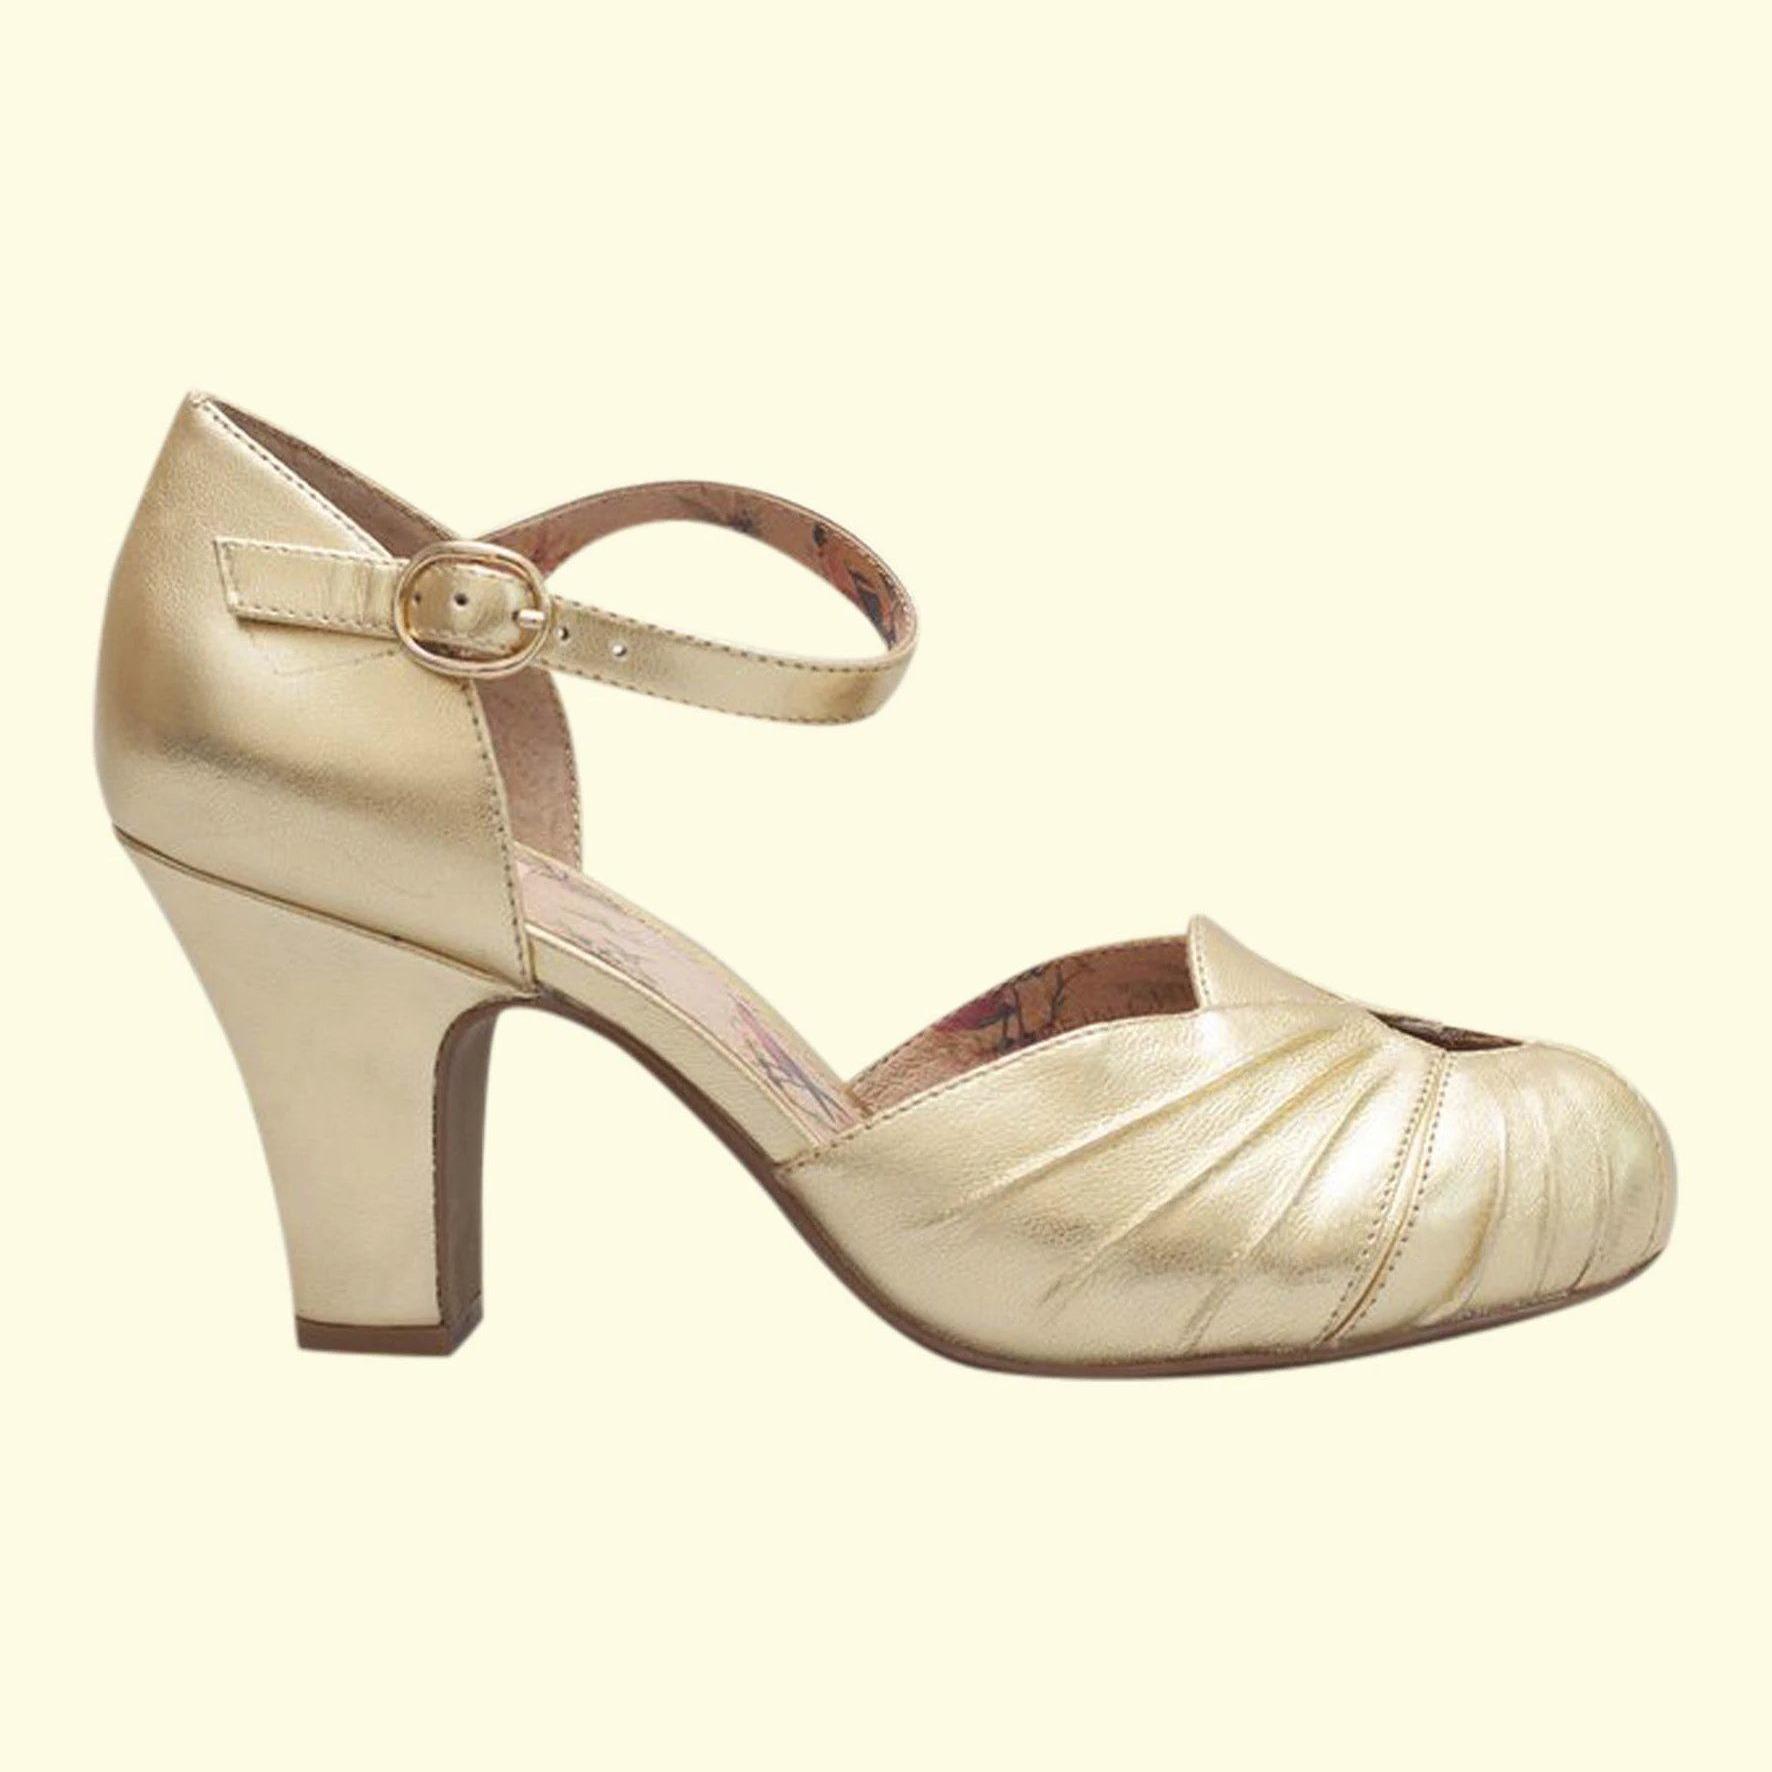 Guld sko fra Miss L fire